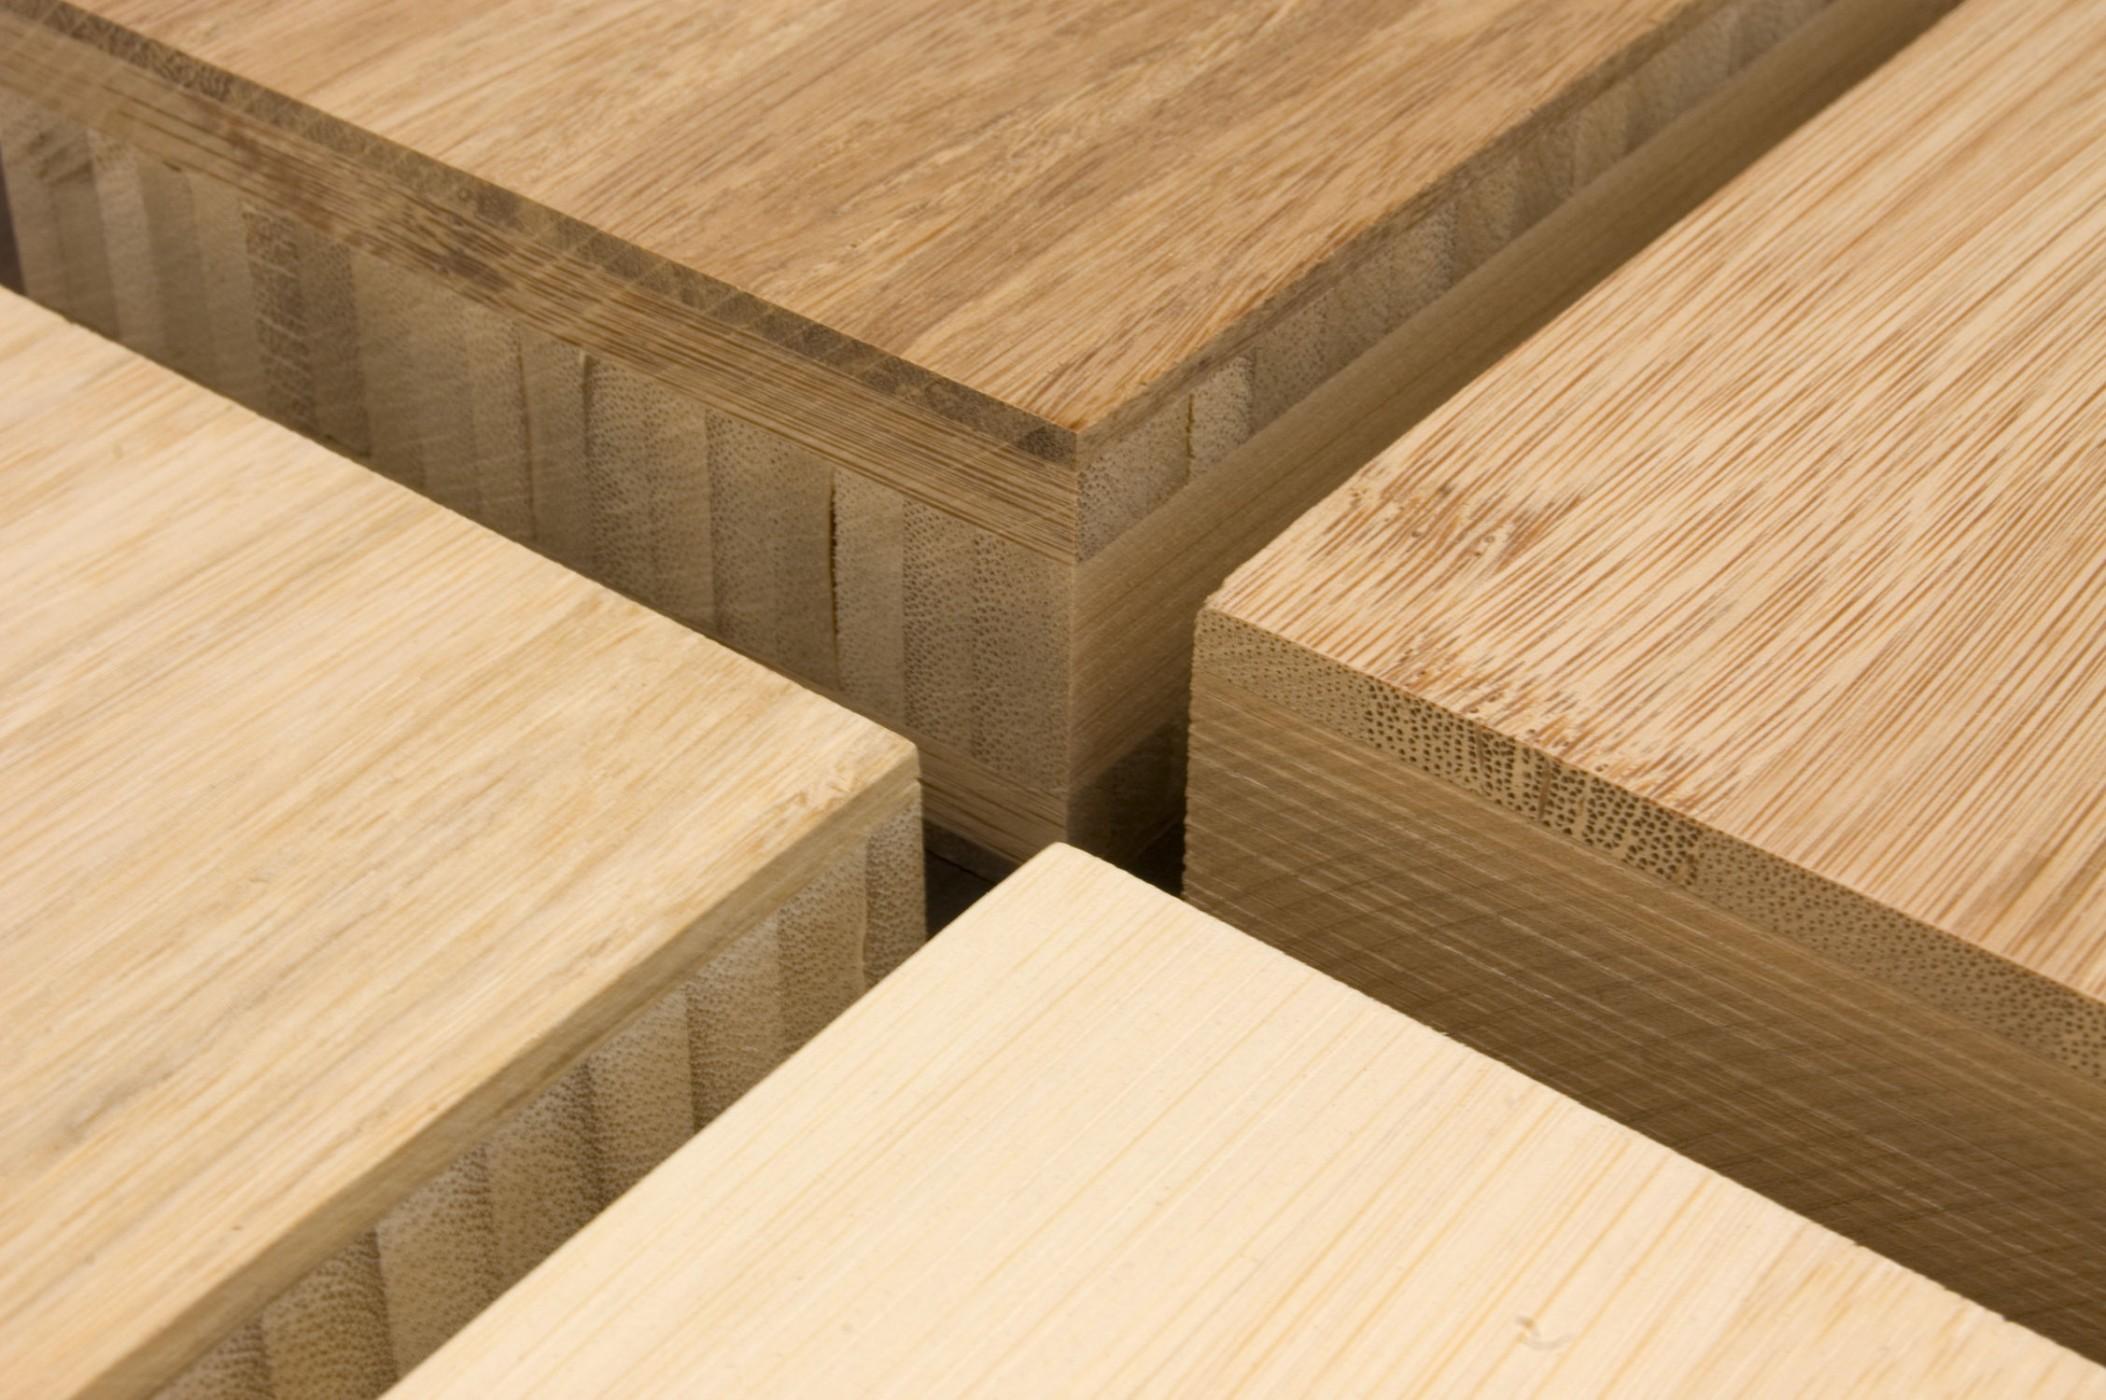 bamboo panels 2 copy